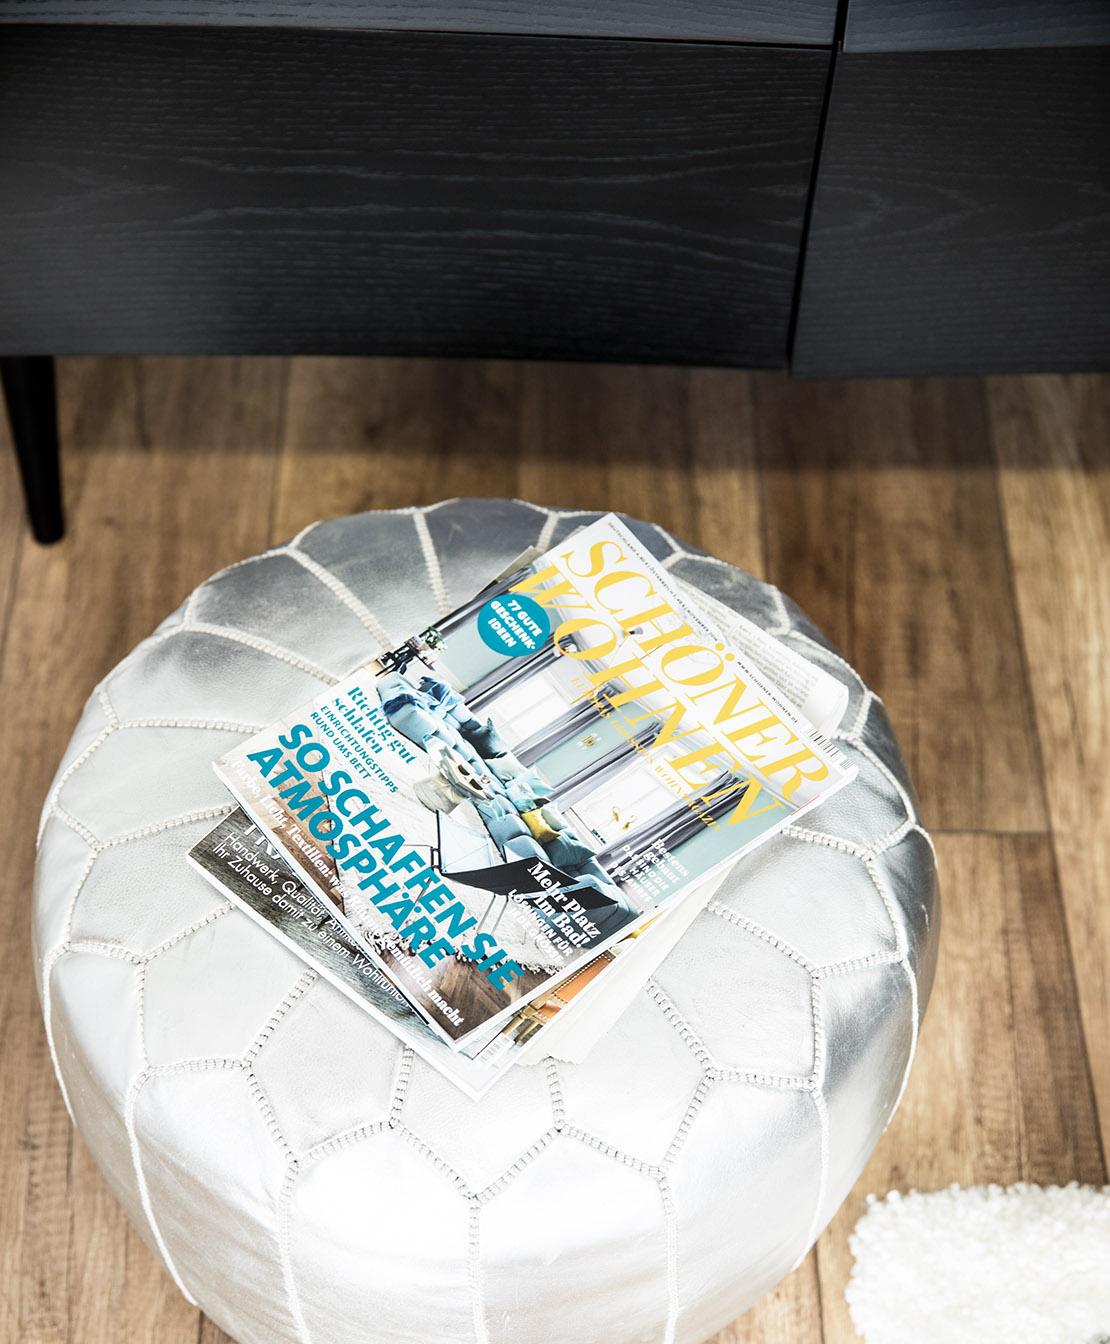 gästezimmer-lesestoff-magazin